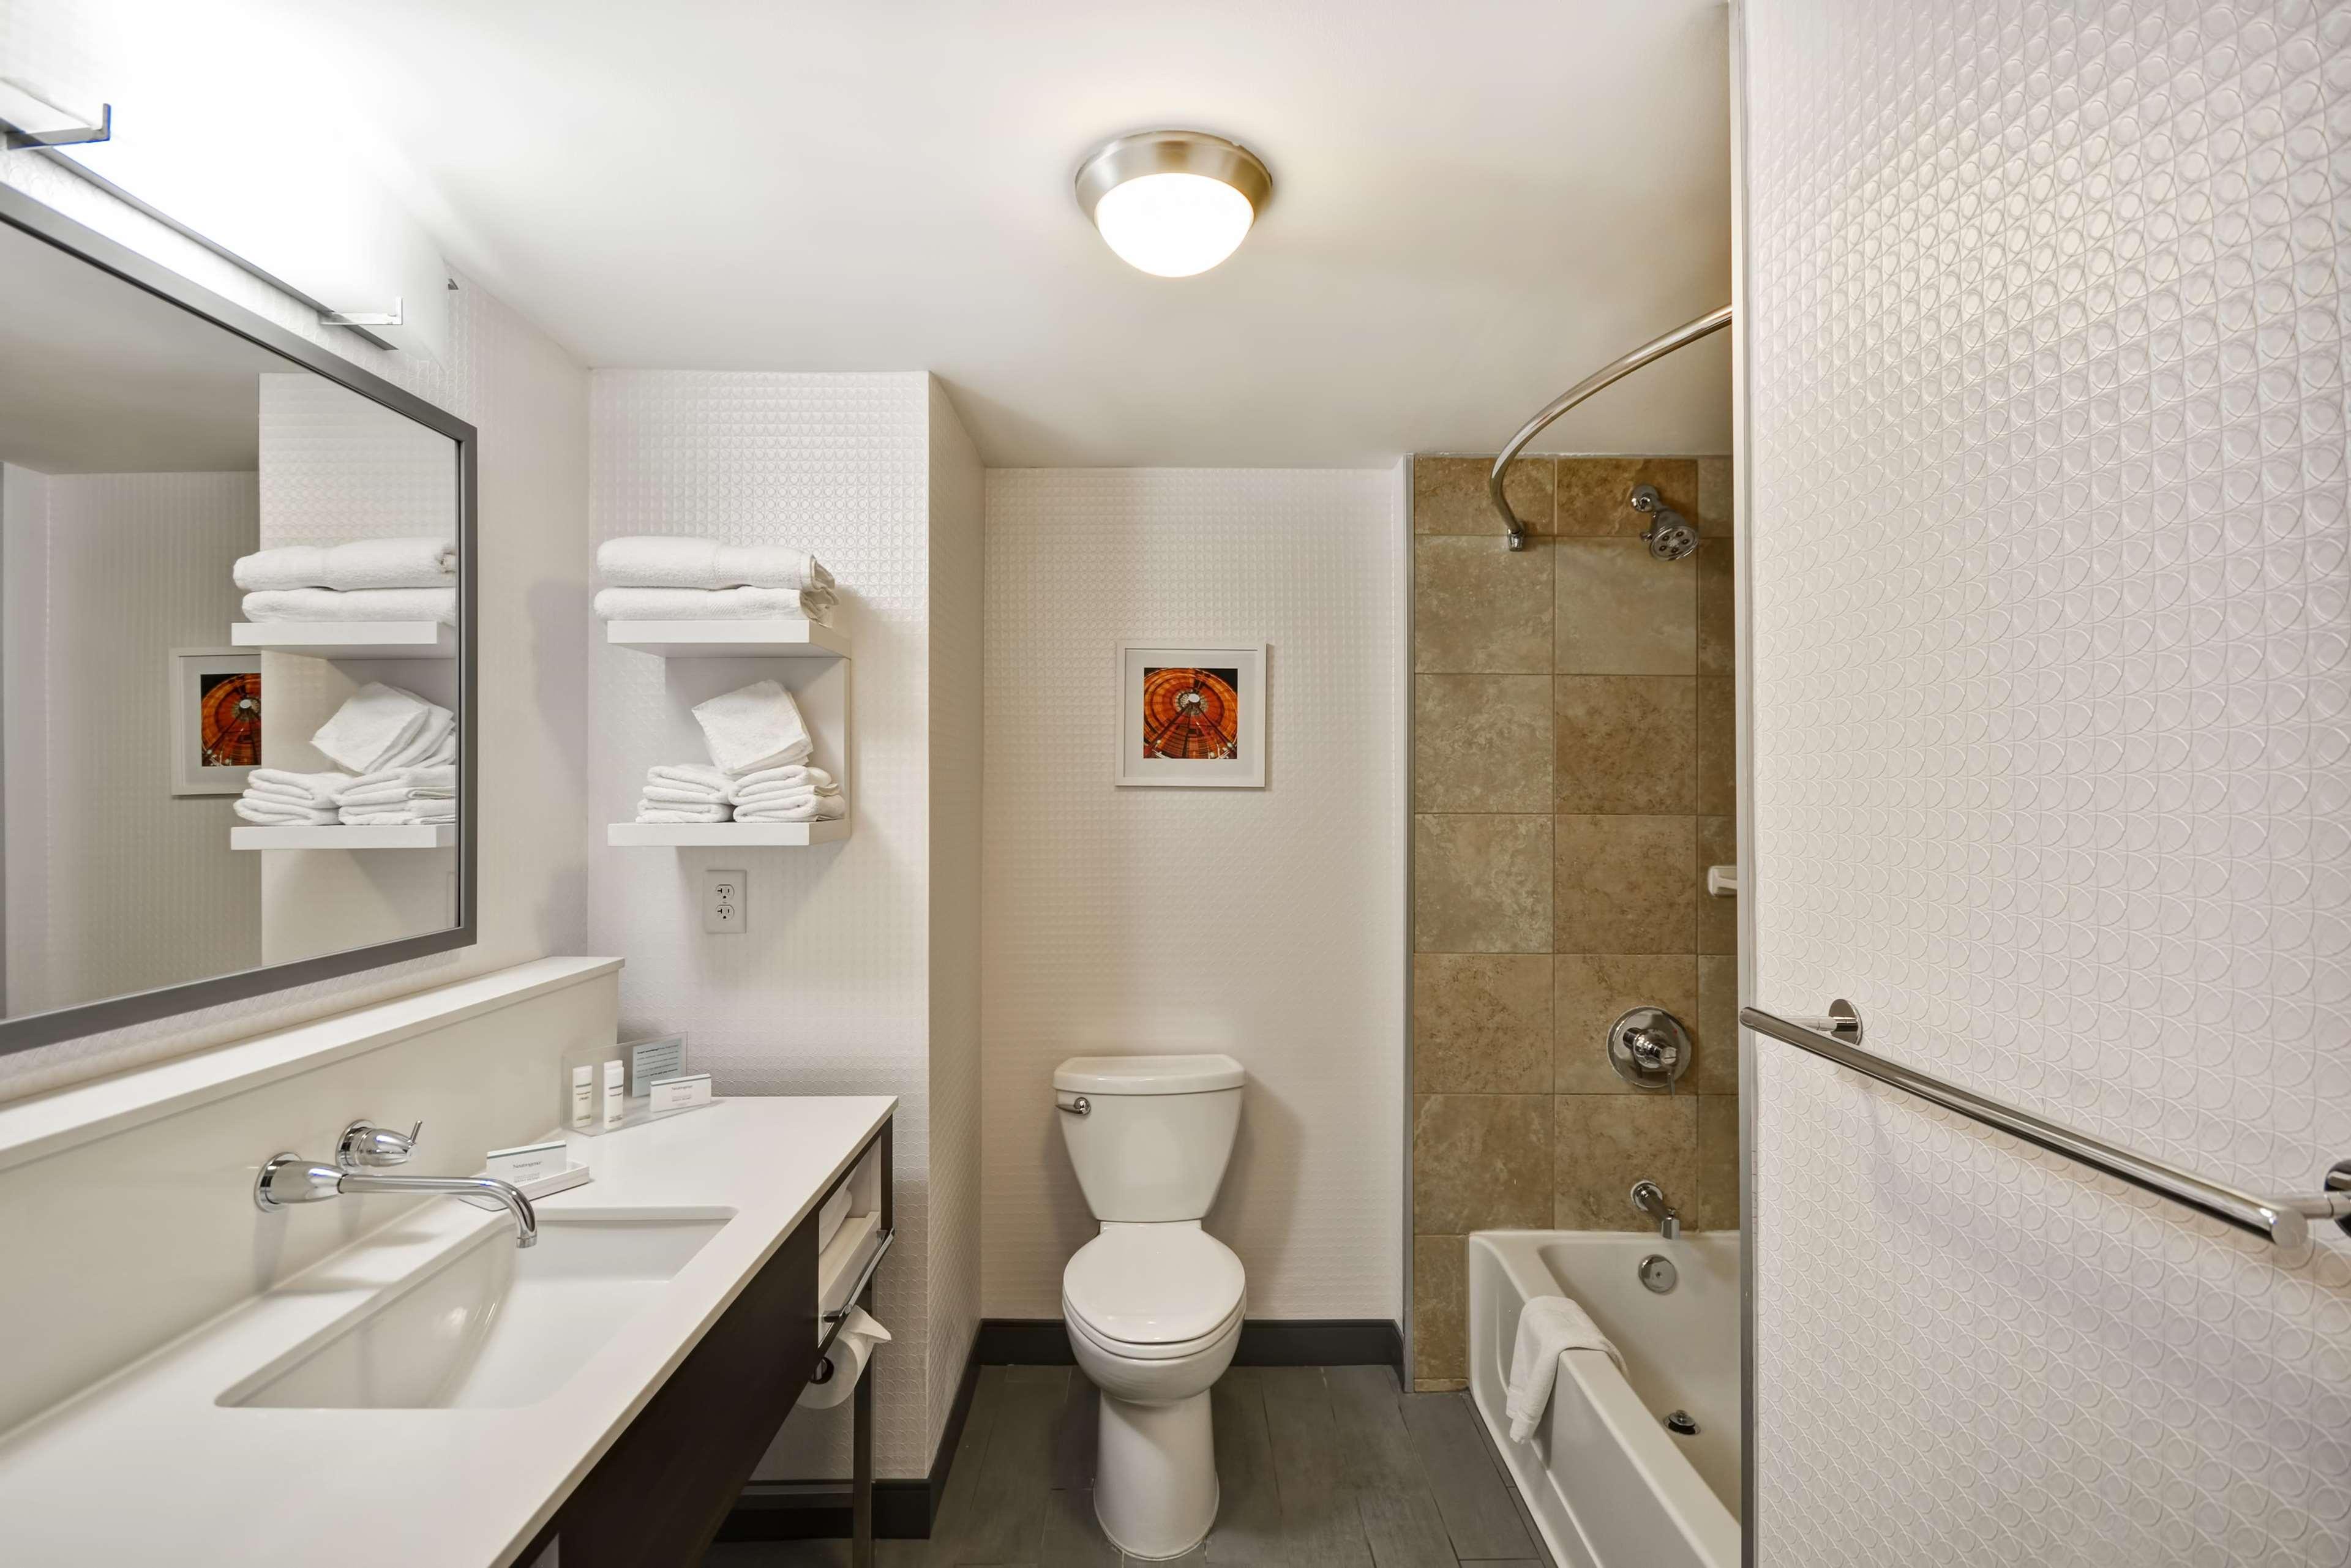 Hampton Inn & Suites Columbus-Easton Area image 52